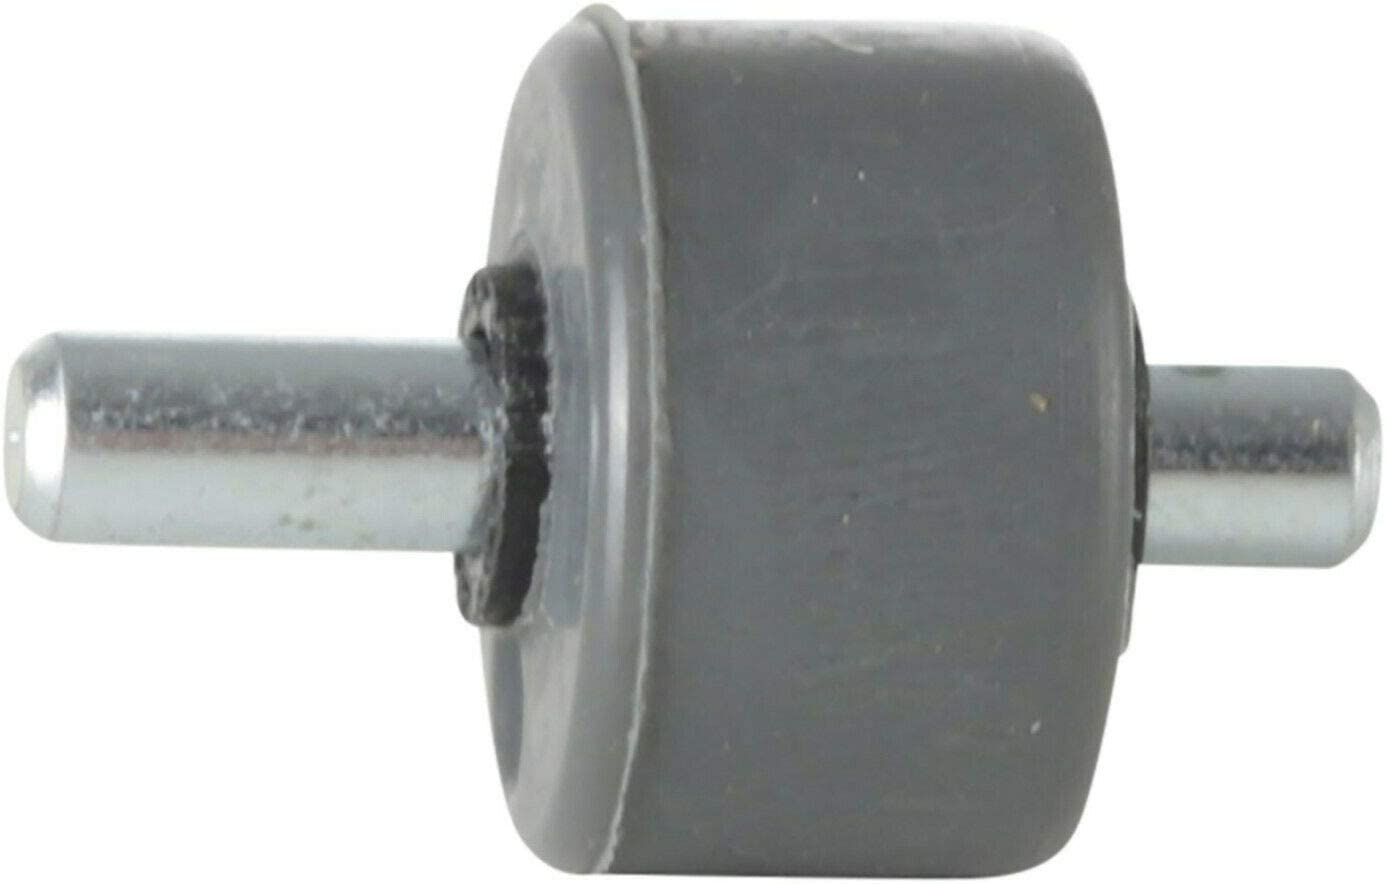 Rowenta - Cepillo para aspiradora X-Pert 160 RH7221 RH7233 RH7237: Amazon.es: Hogar